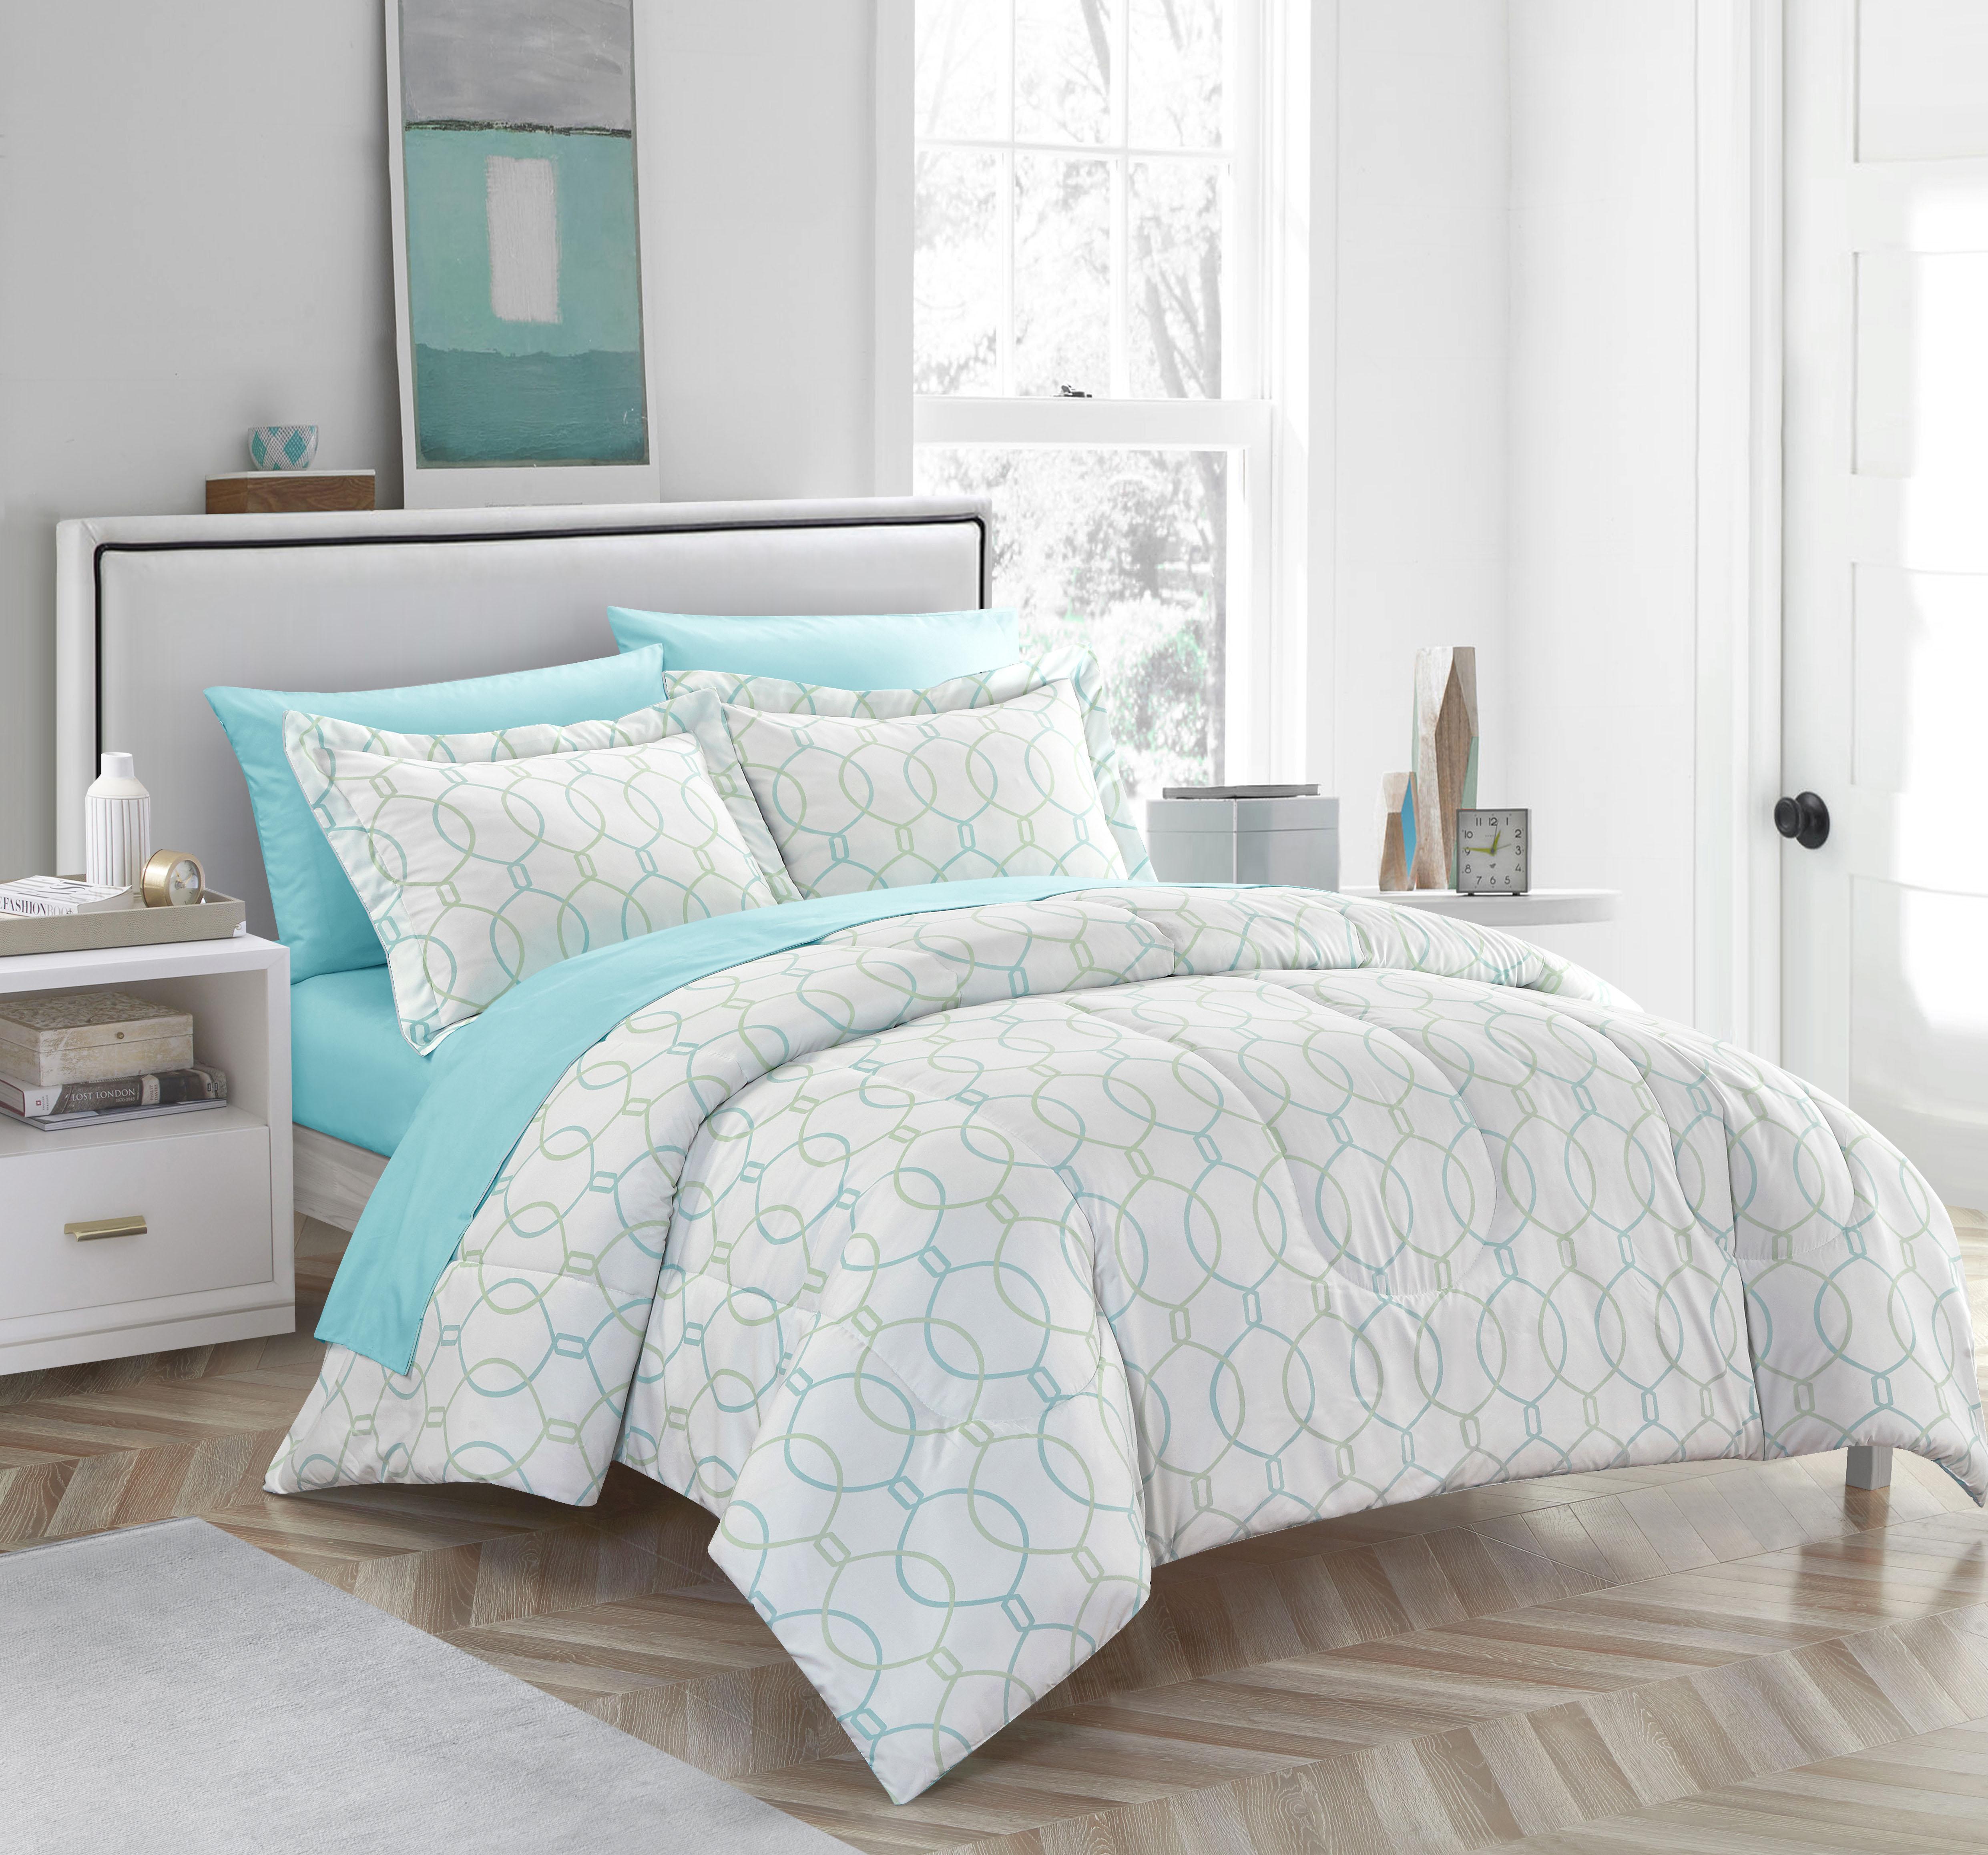 Nanshing Monarch 7-Piece Comforter Set